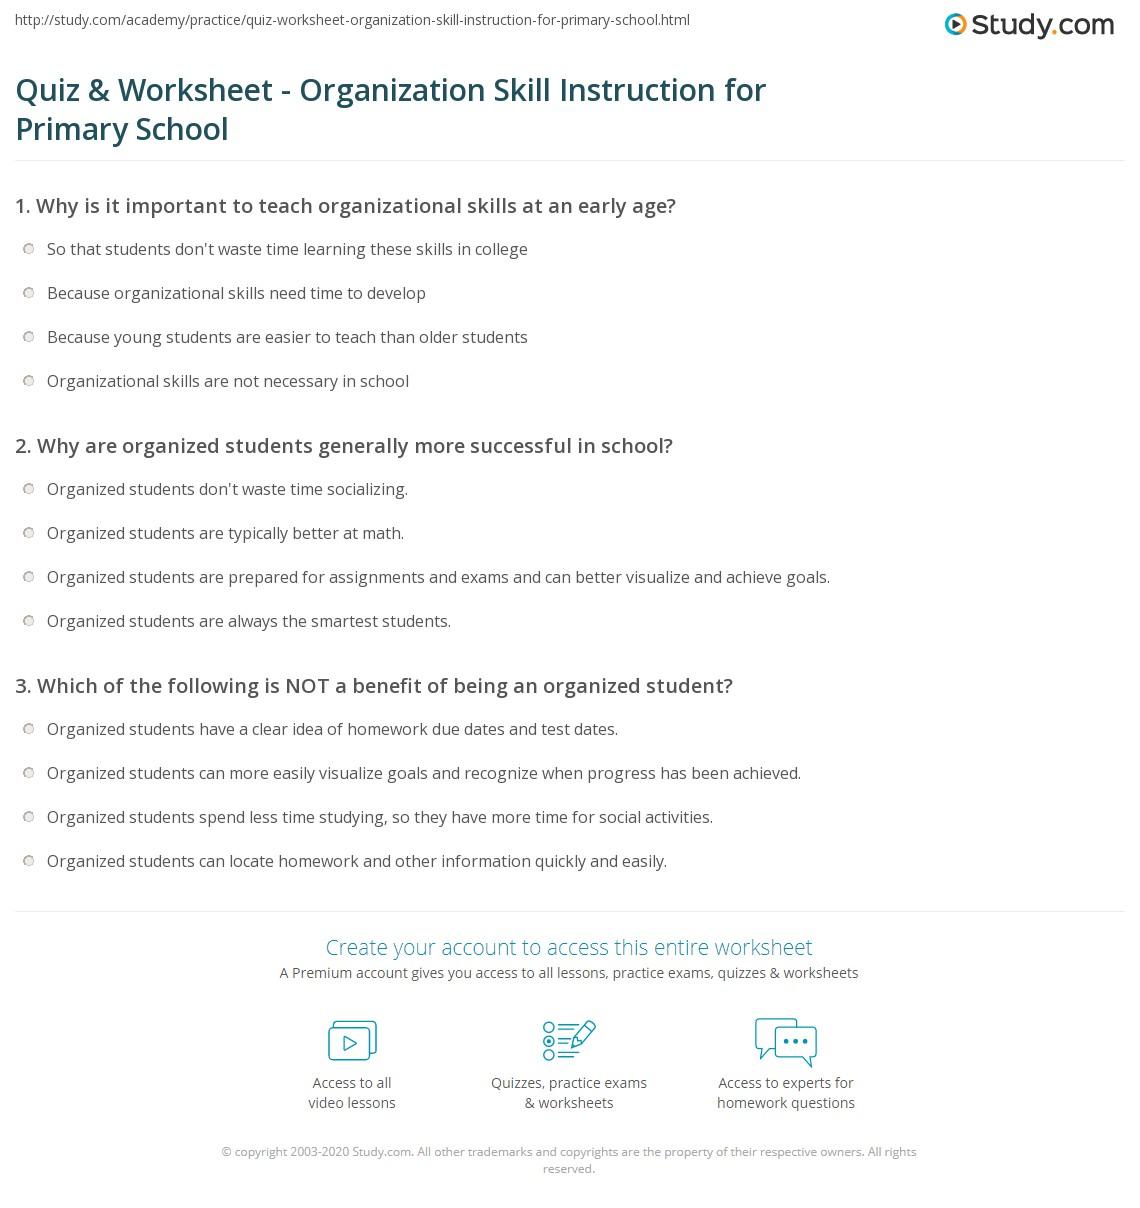 quiz worksheet organization skill instruction for primary print teaching organization skills to elementary students worksheet